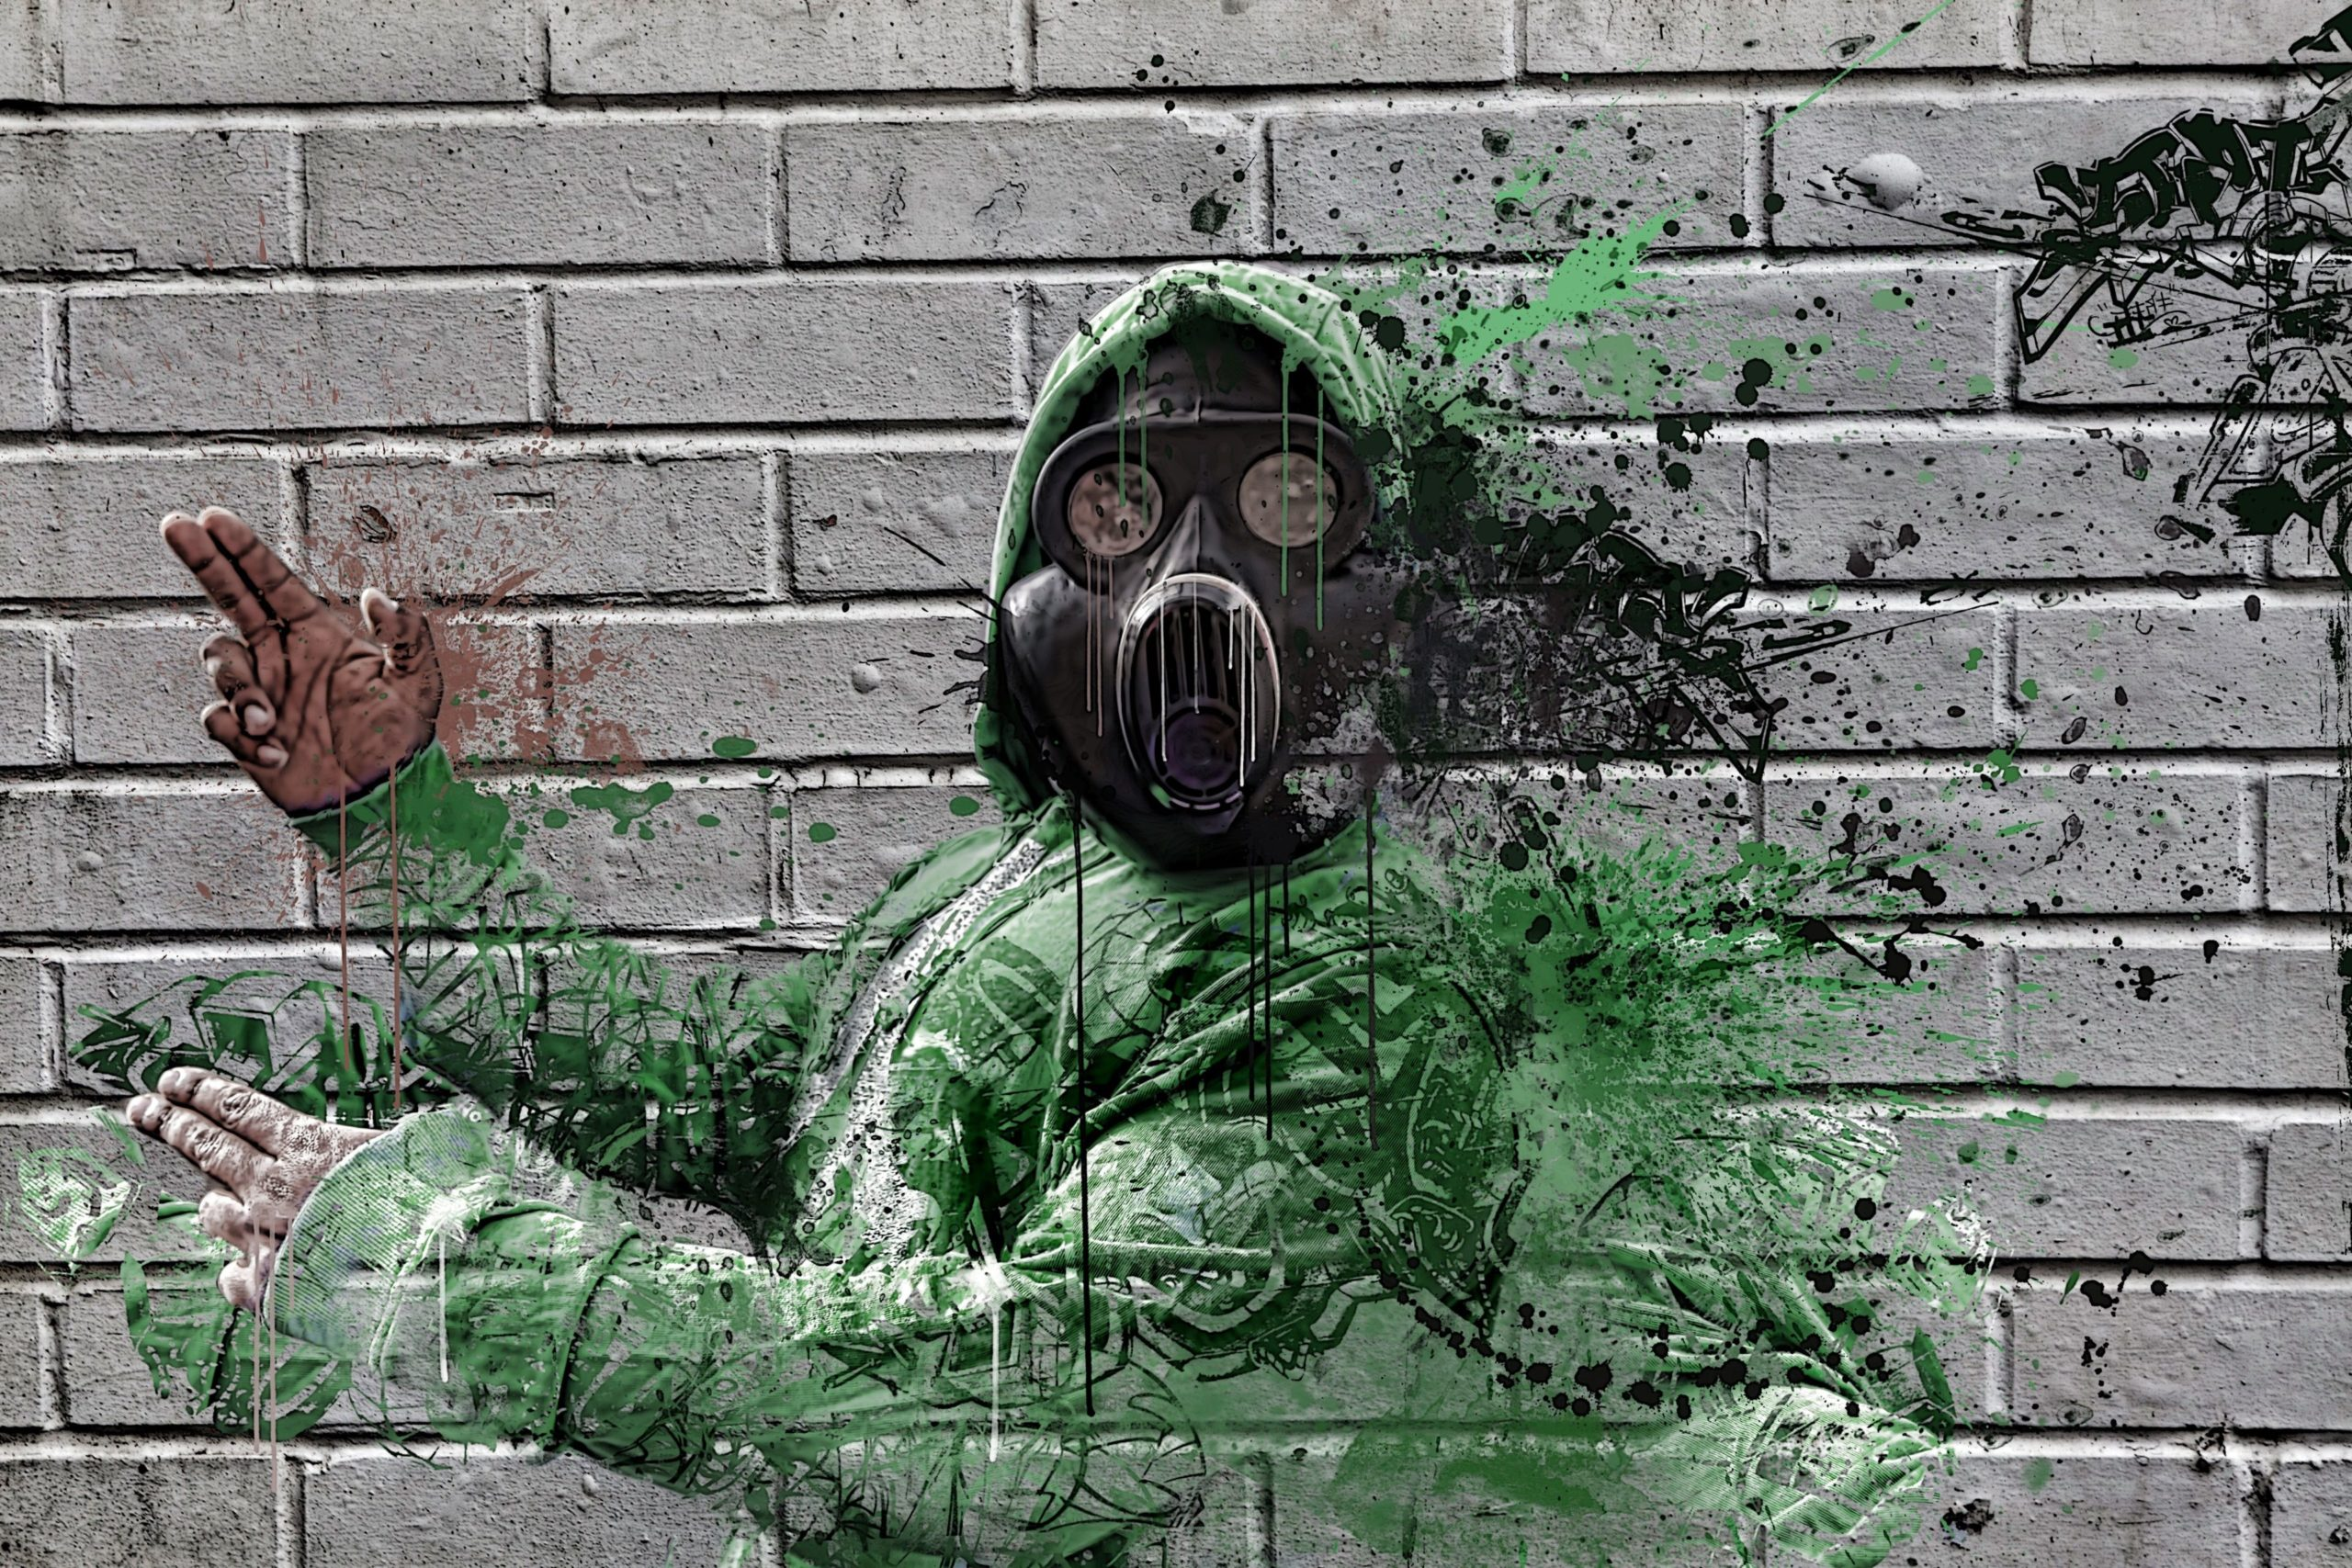 street wall art 4k